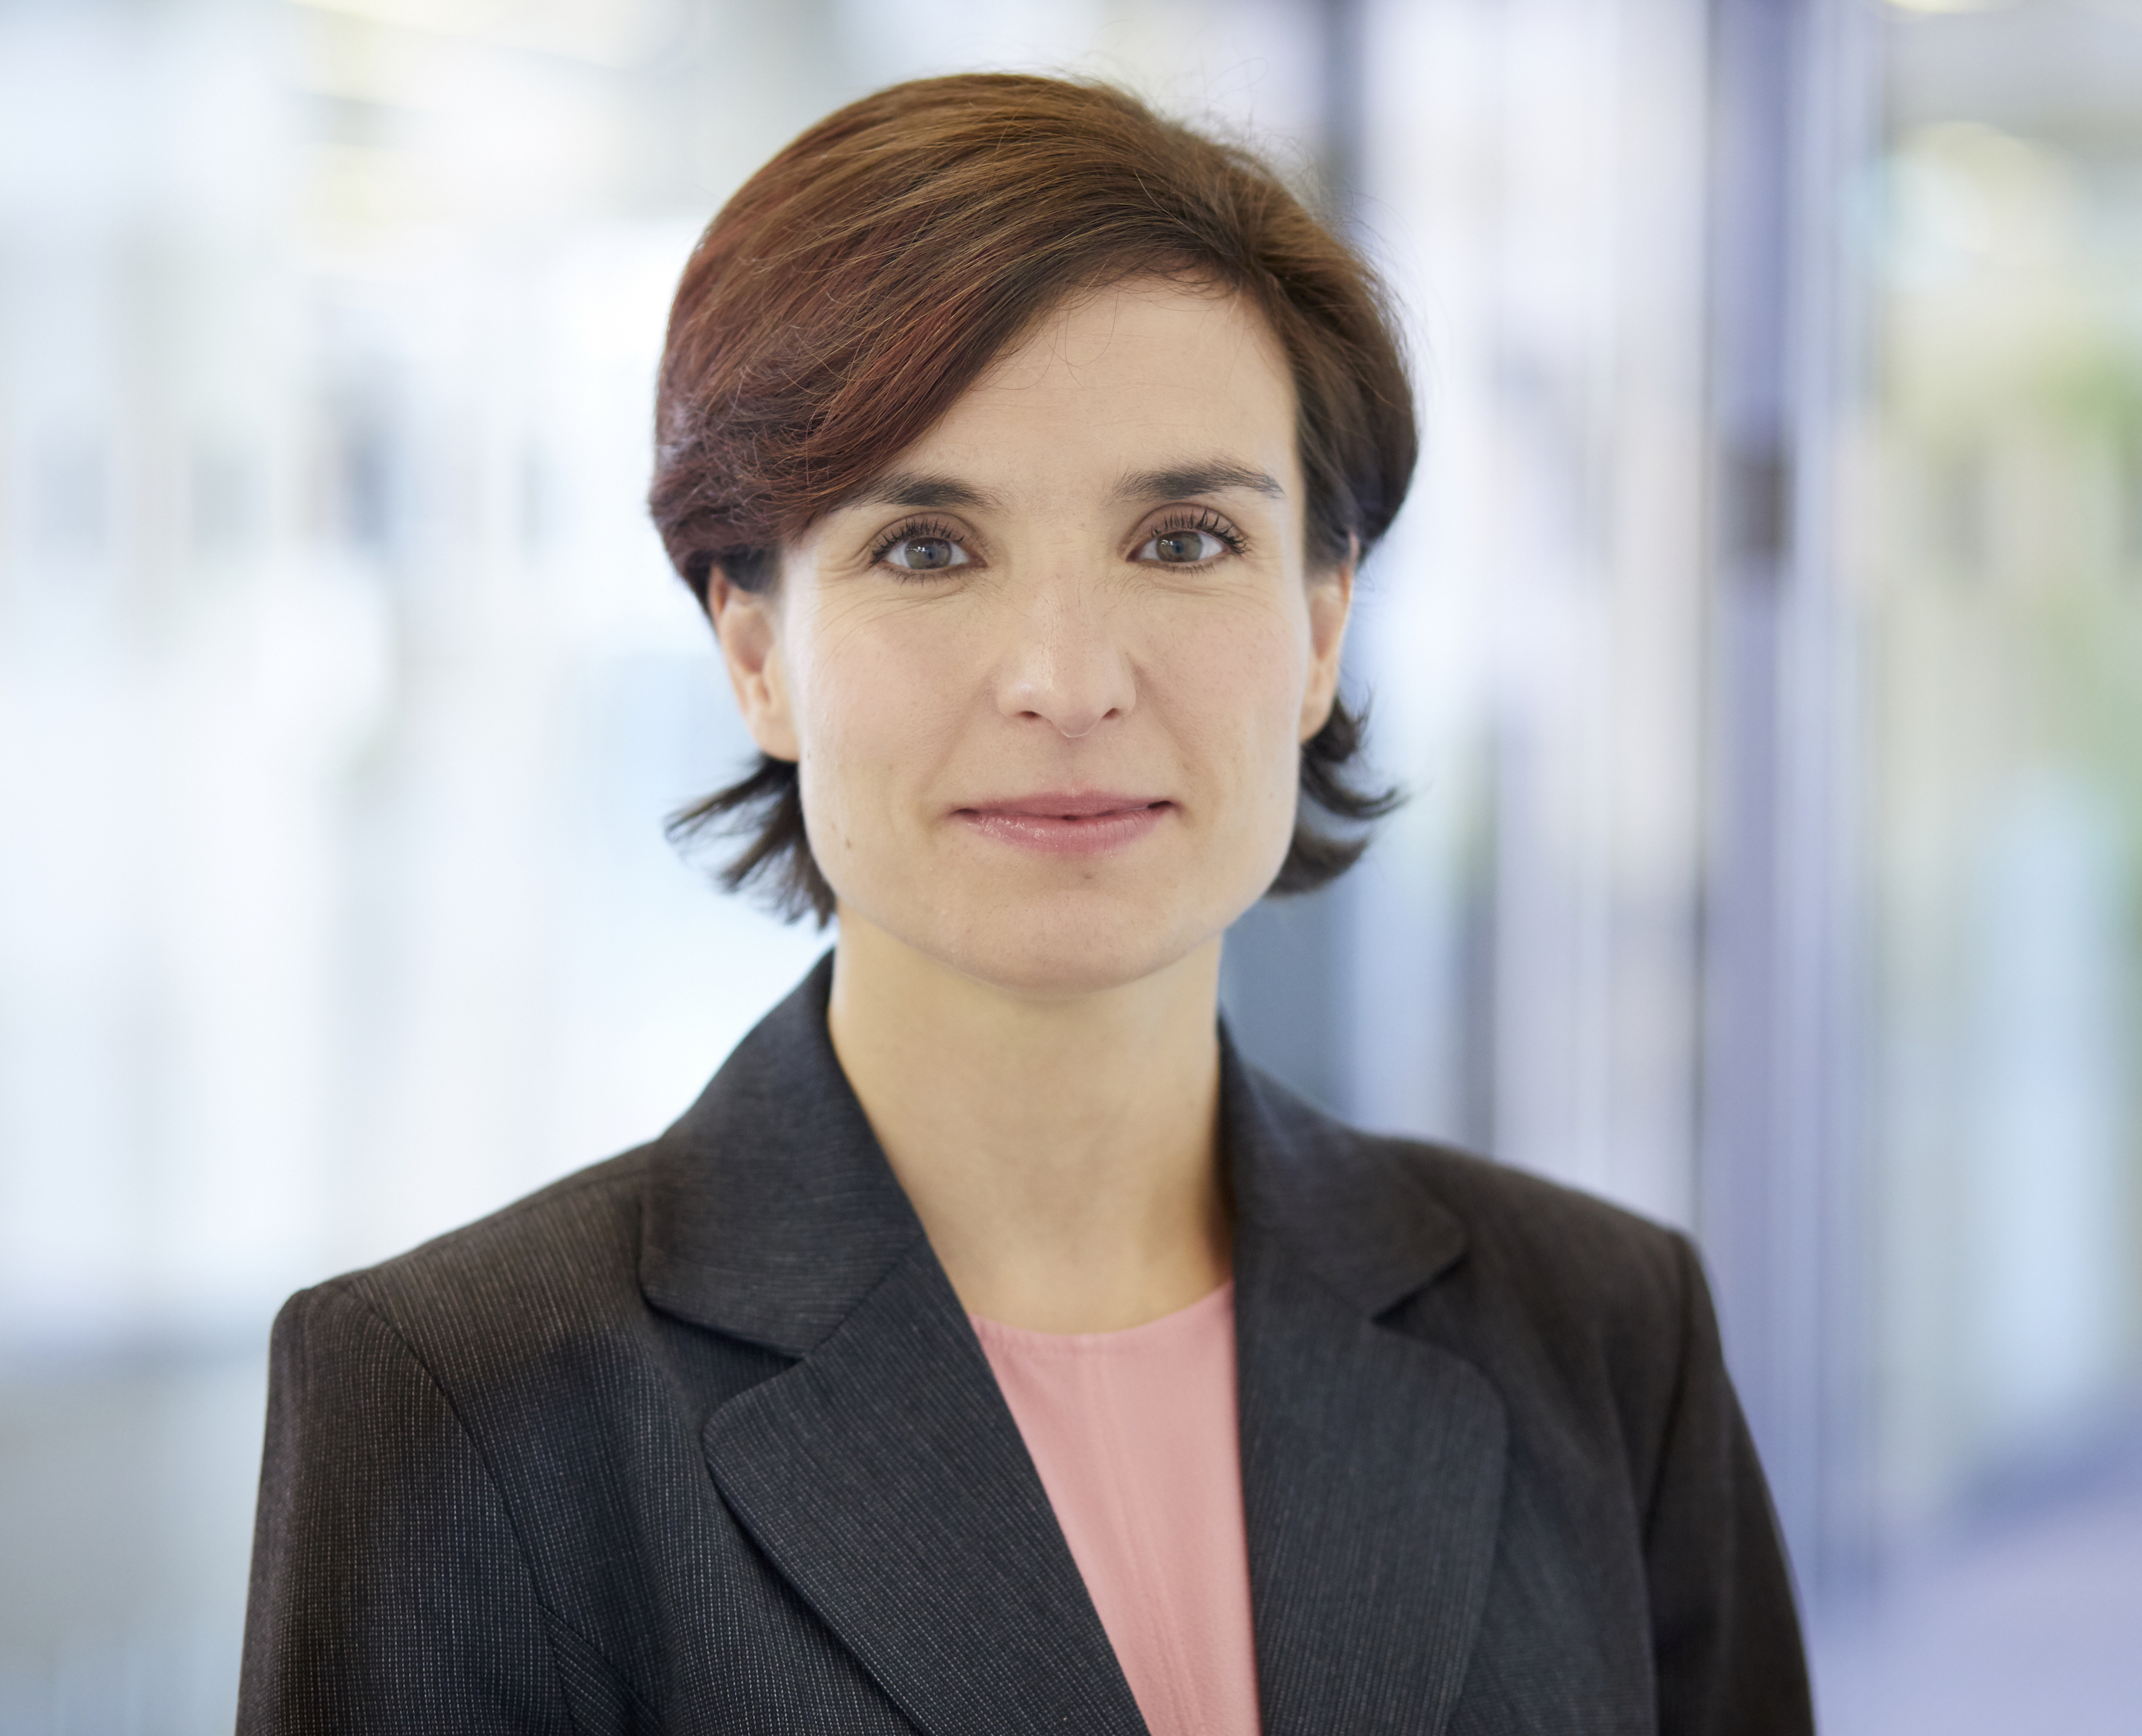 Prof. Dr. Juliane Köberlein-Neu